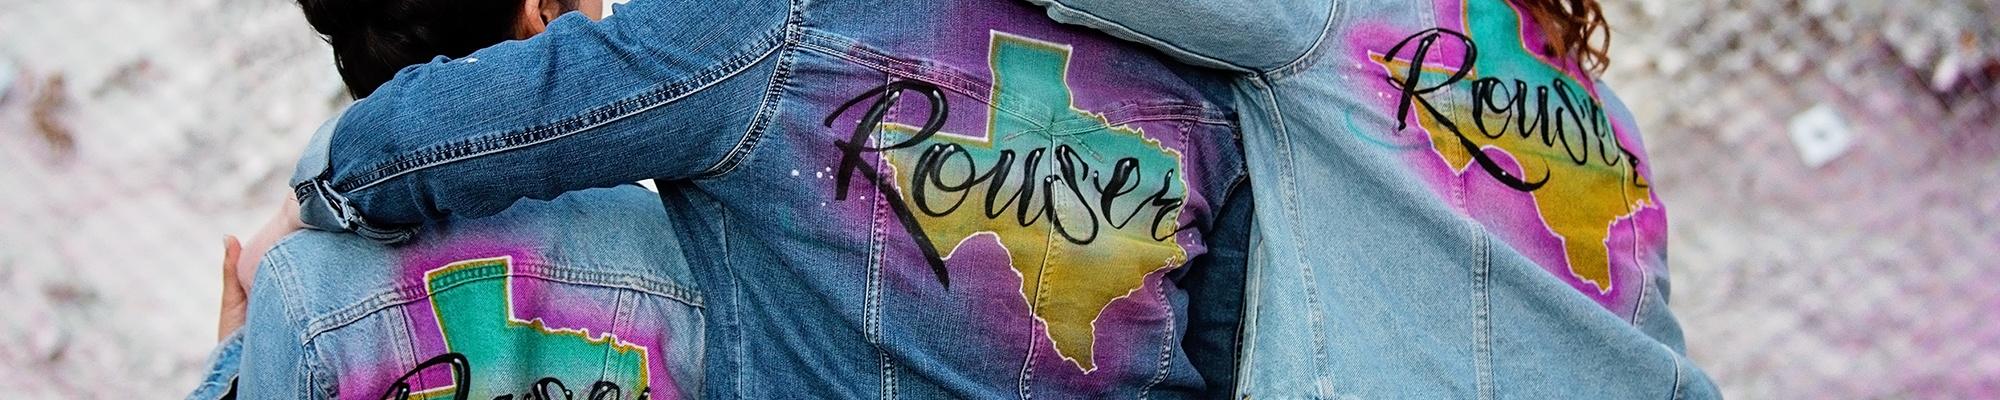 rouser Cover